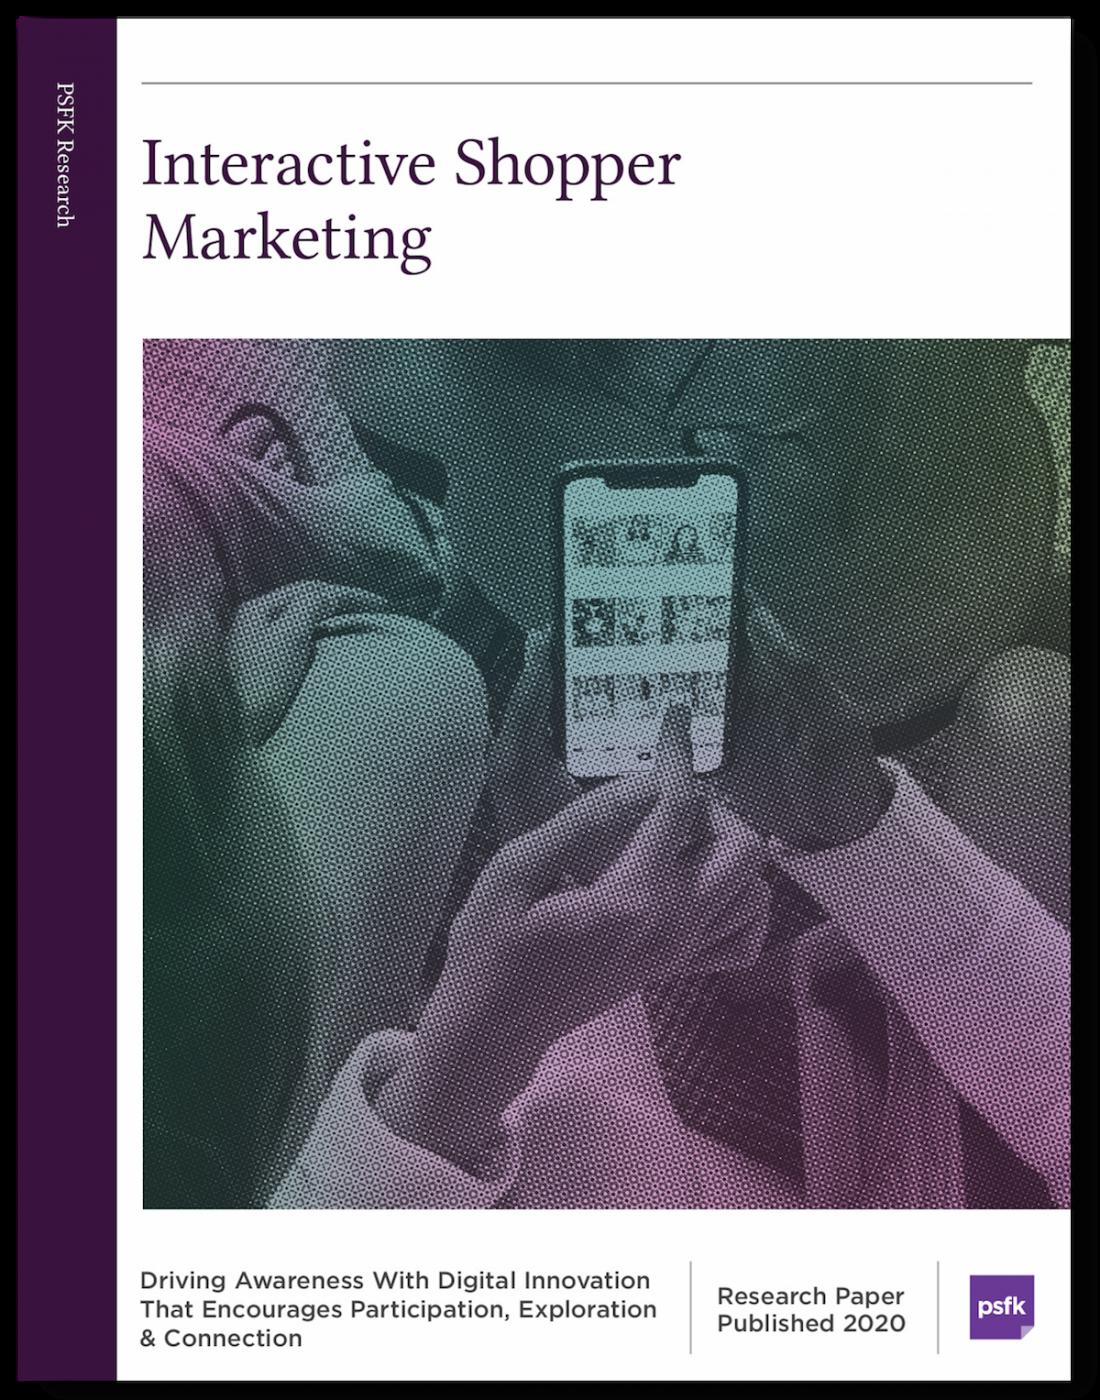 Interactive Shopper Marketing